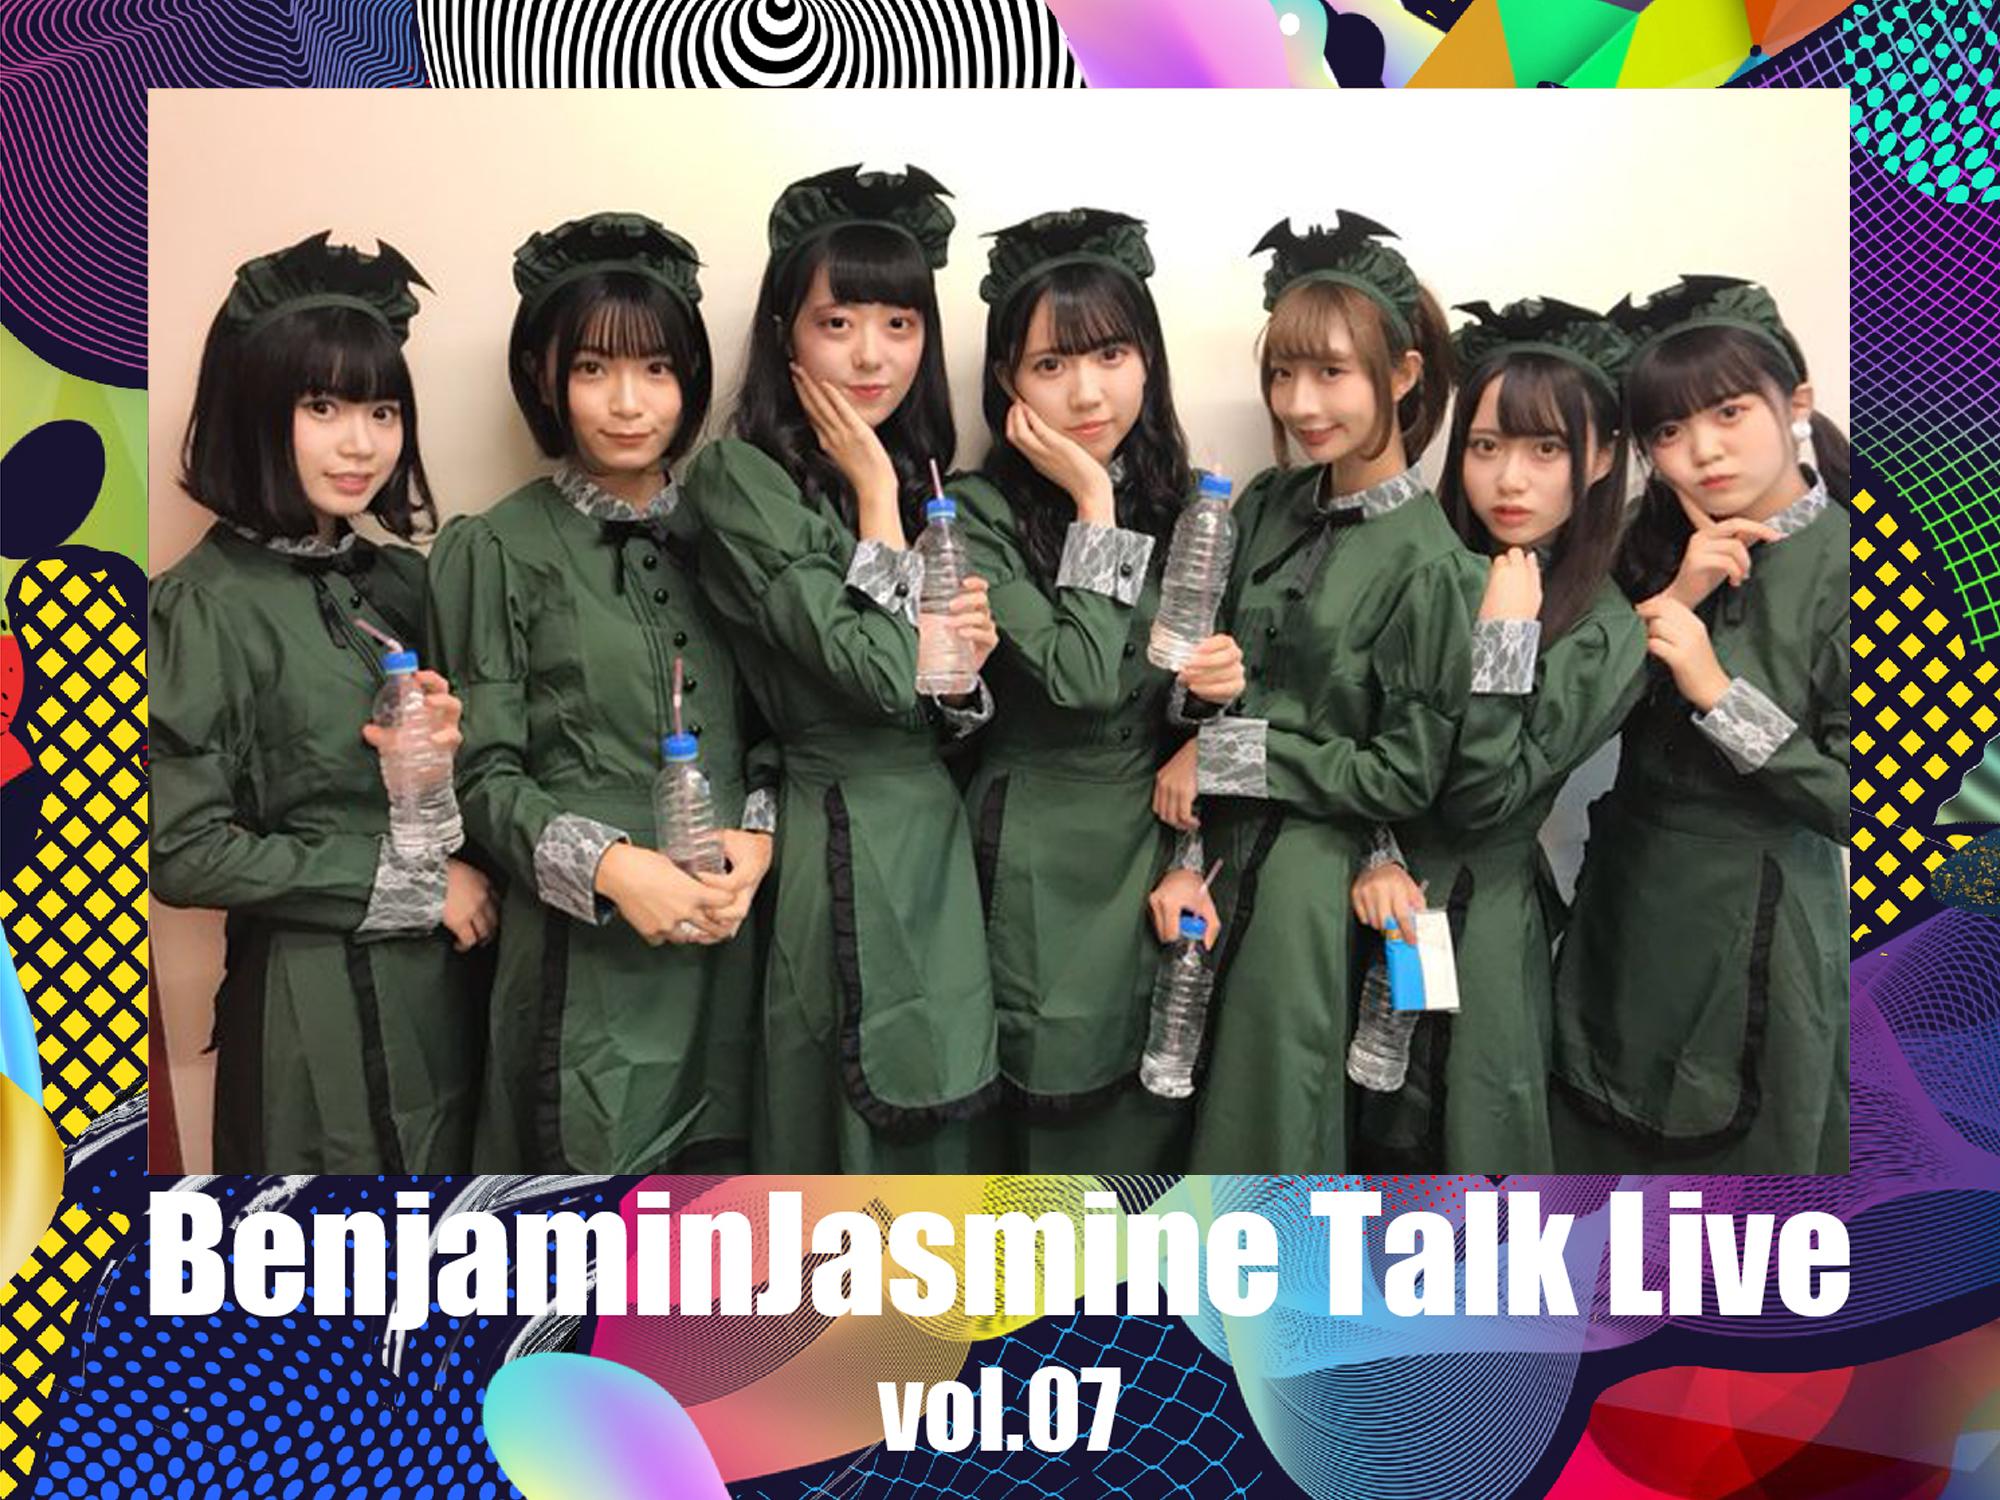 11月30日(土)『BenjaminJasmine Talk Live vol.07』開催決定